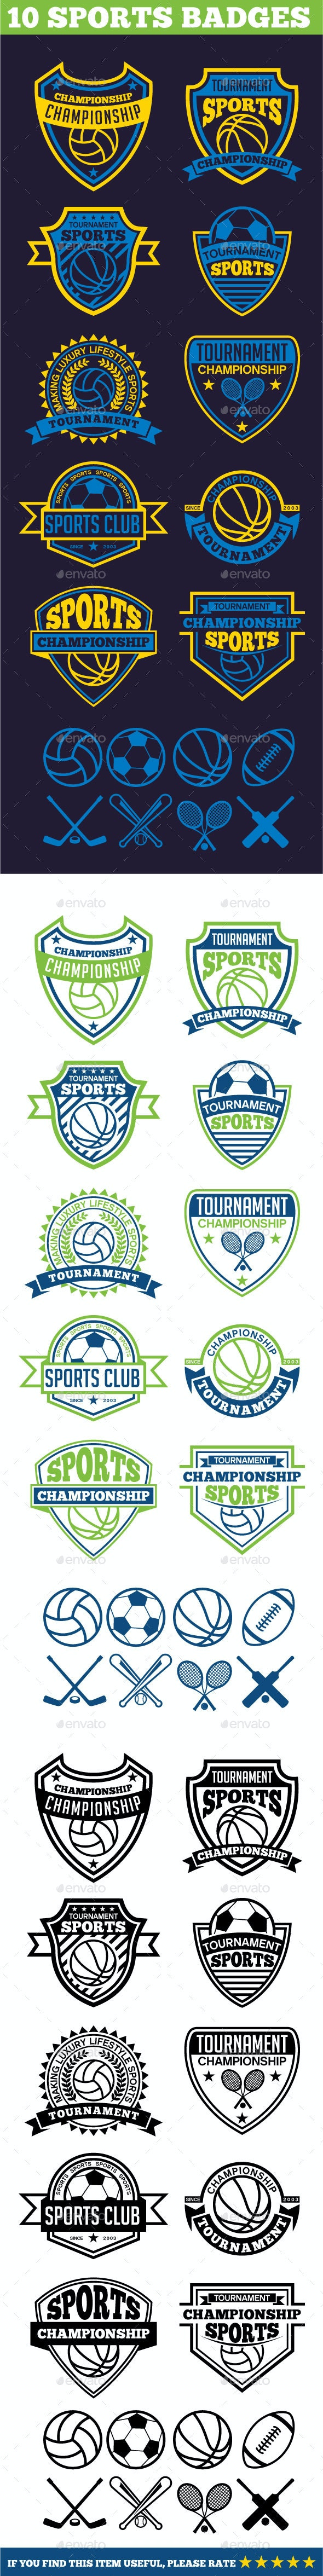 10 Sports Badges - Badges & Stickers Web Elements